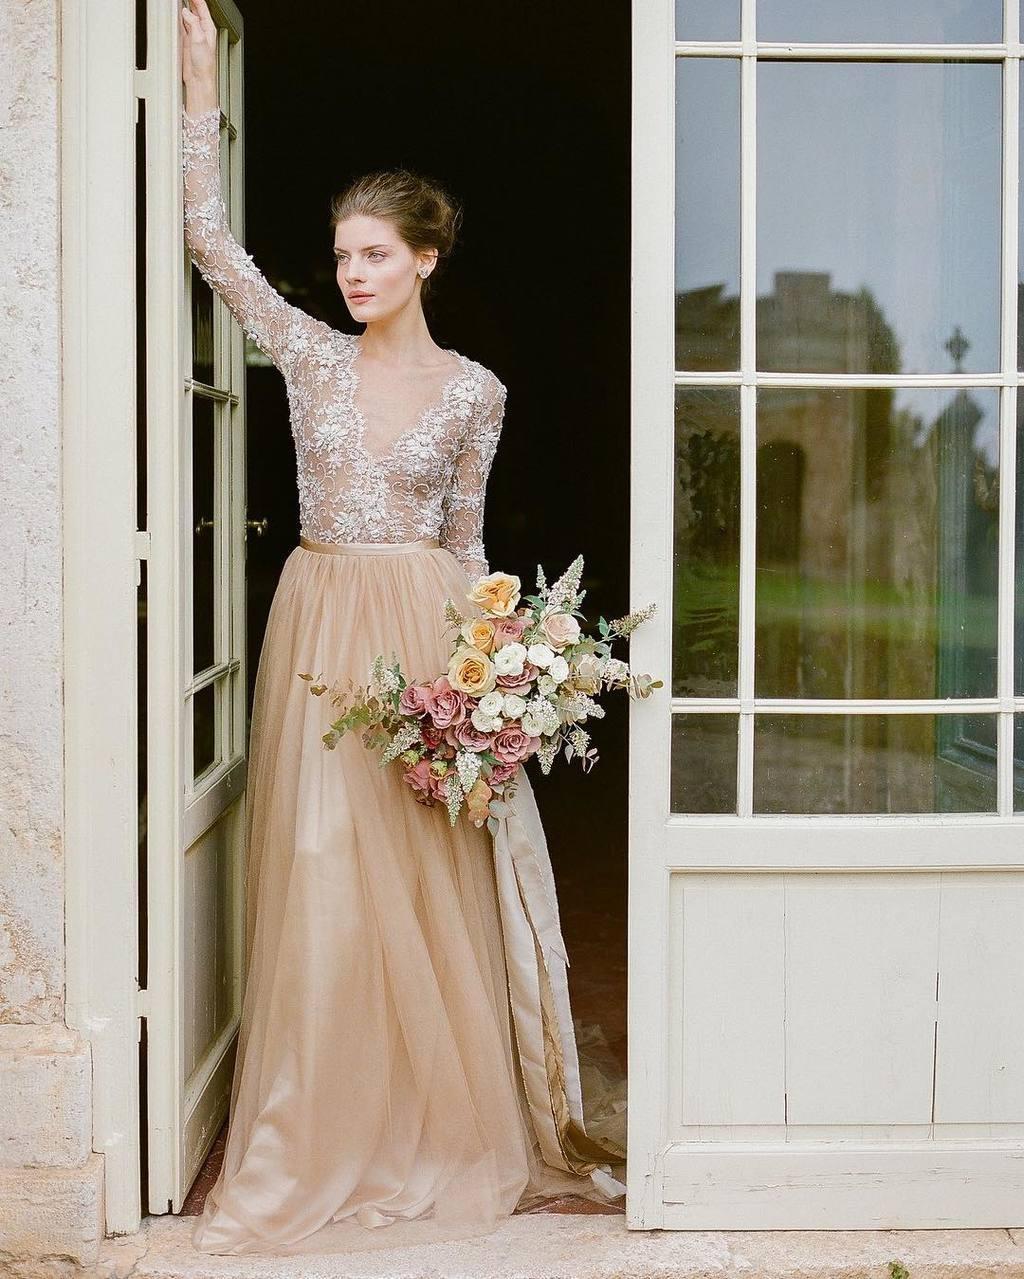 bridal separates long skirt bridesmaids skirt modest wedding dress Blue wedding skirt wedding separates alternative wedding dress